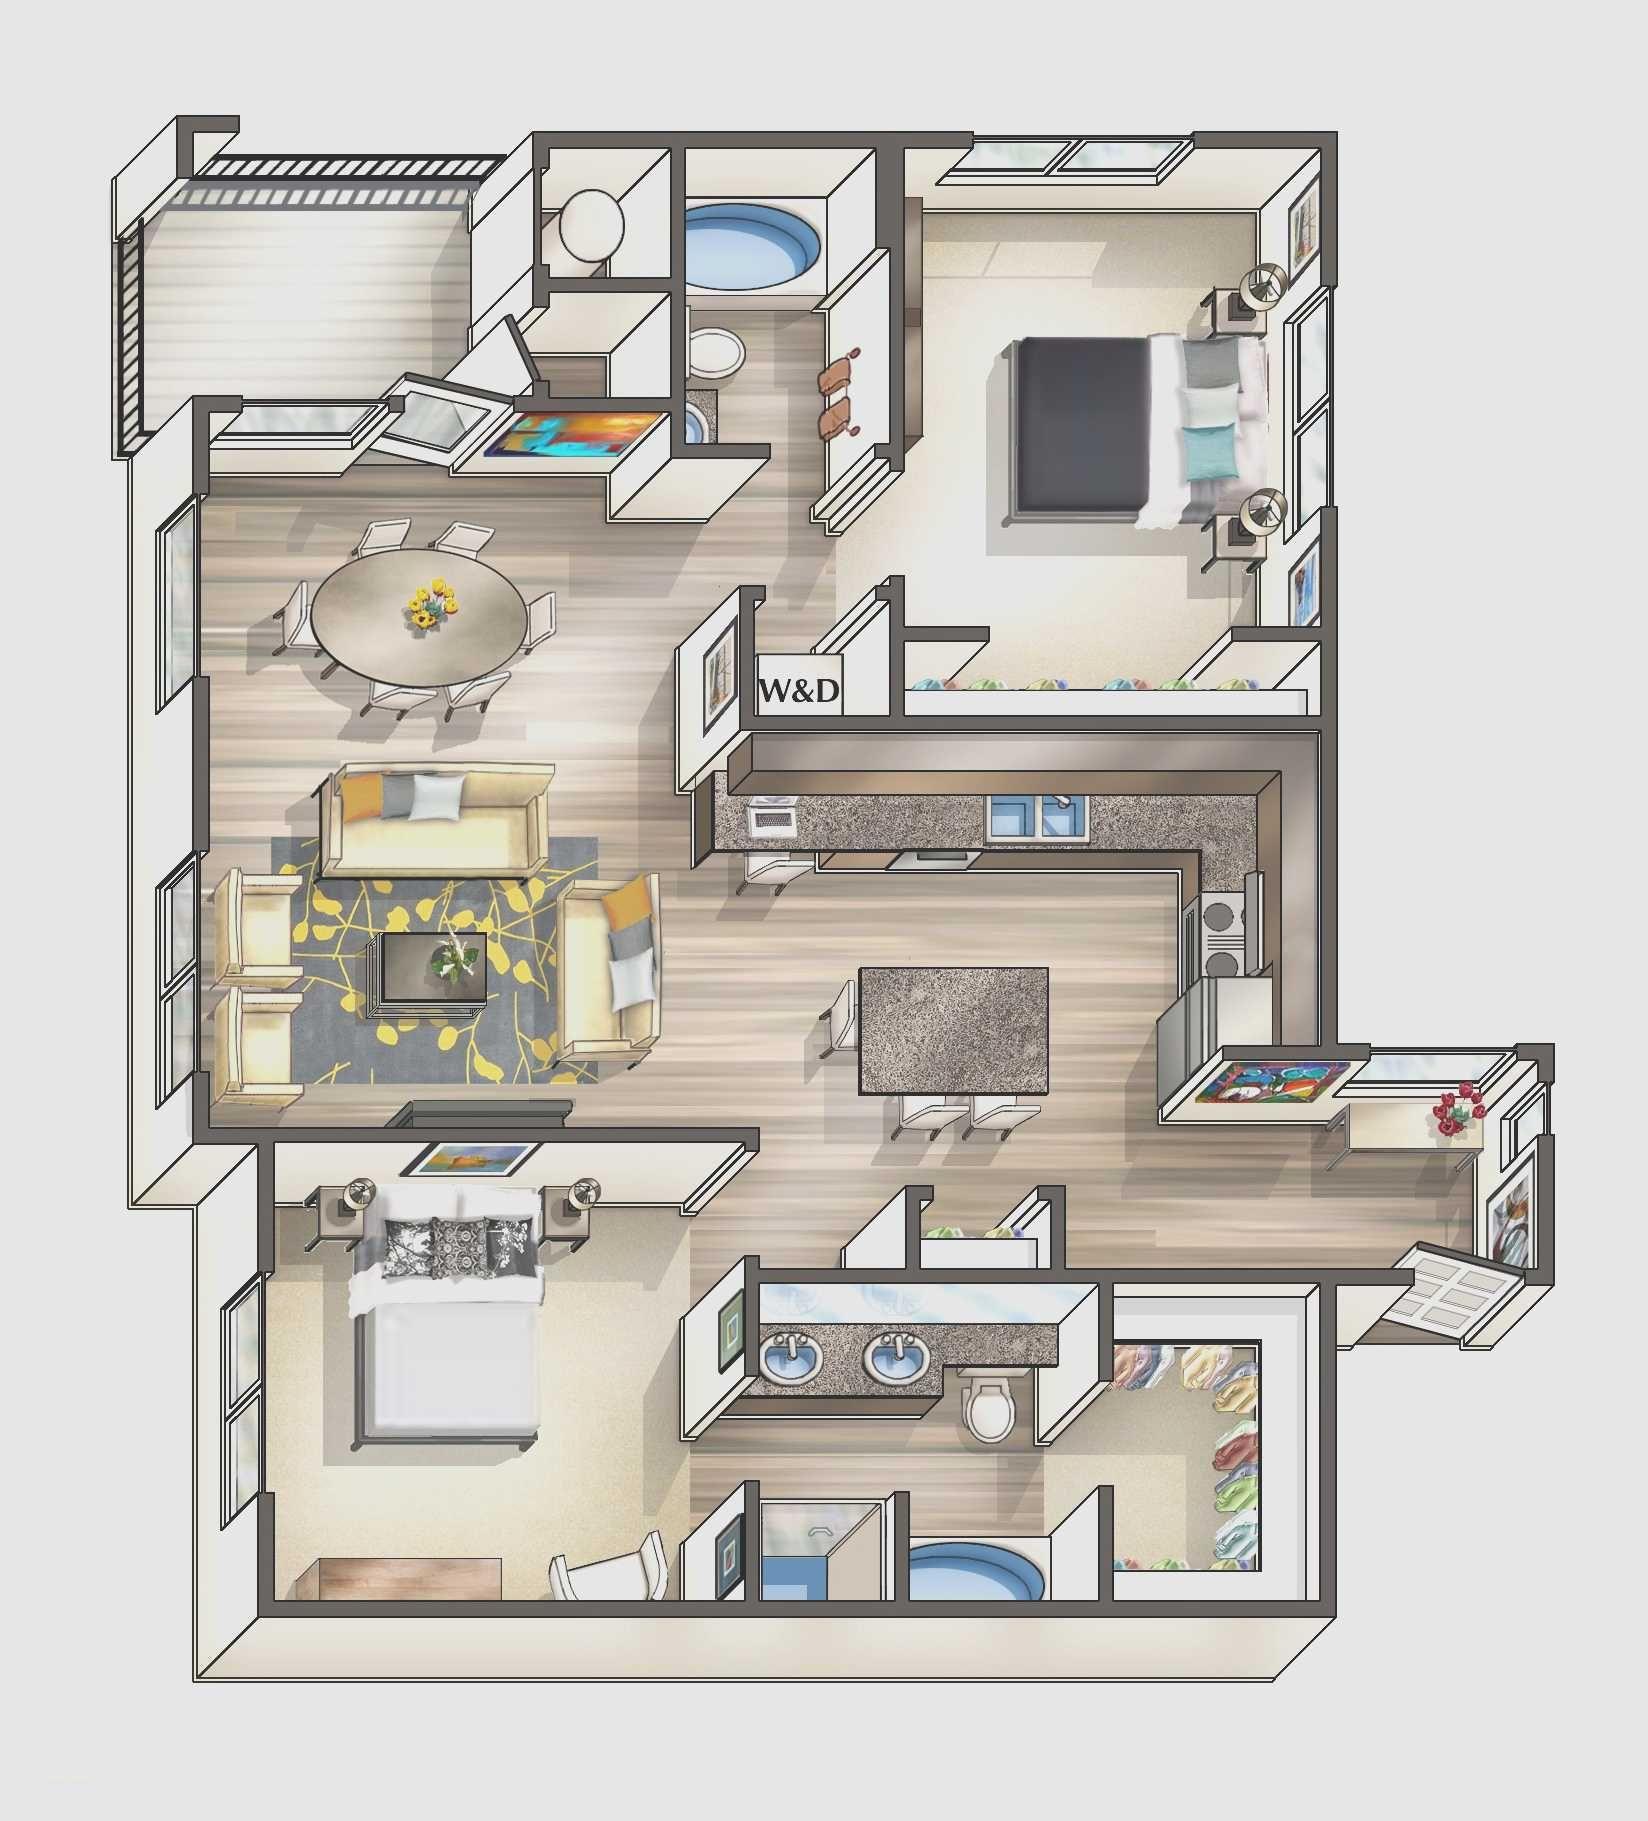 New Tiny Apartment Floor Plans Small Apartment Plans Small Apartment Floor Plans Apartment Floor Plans